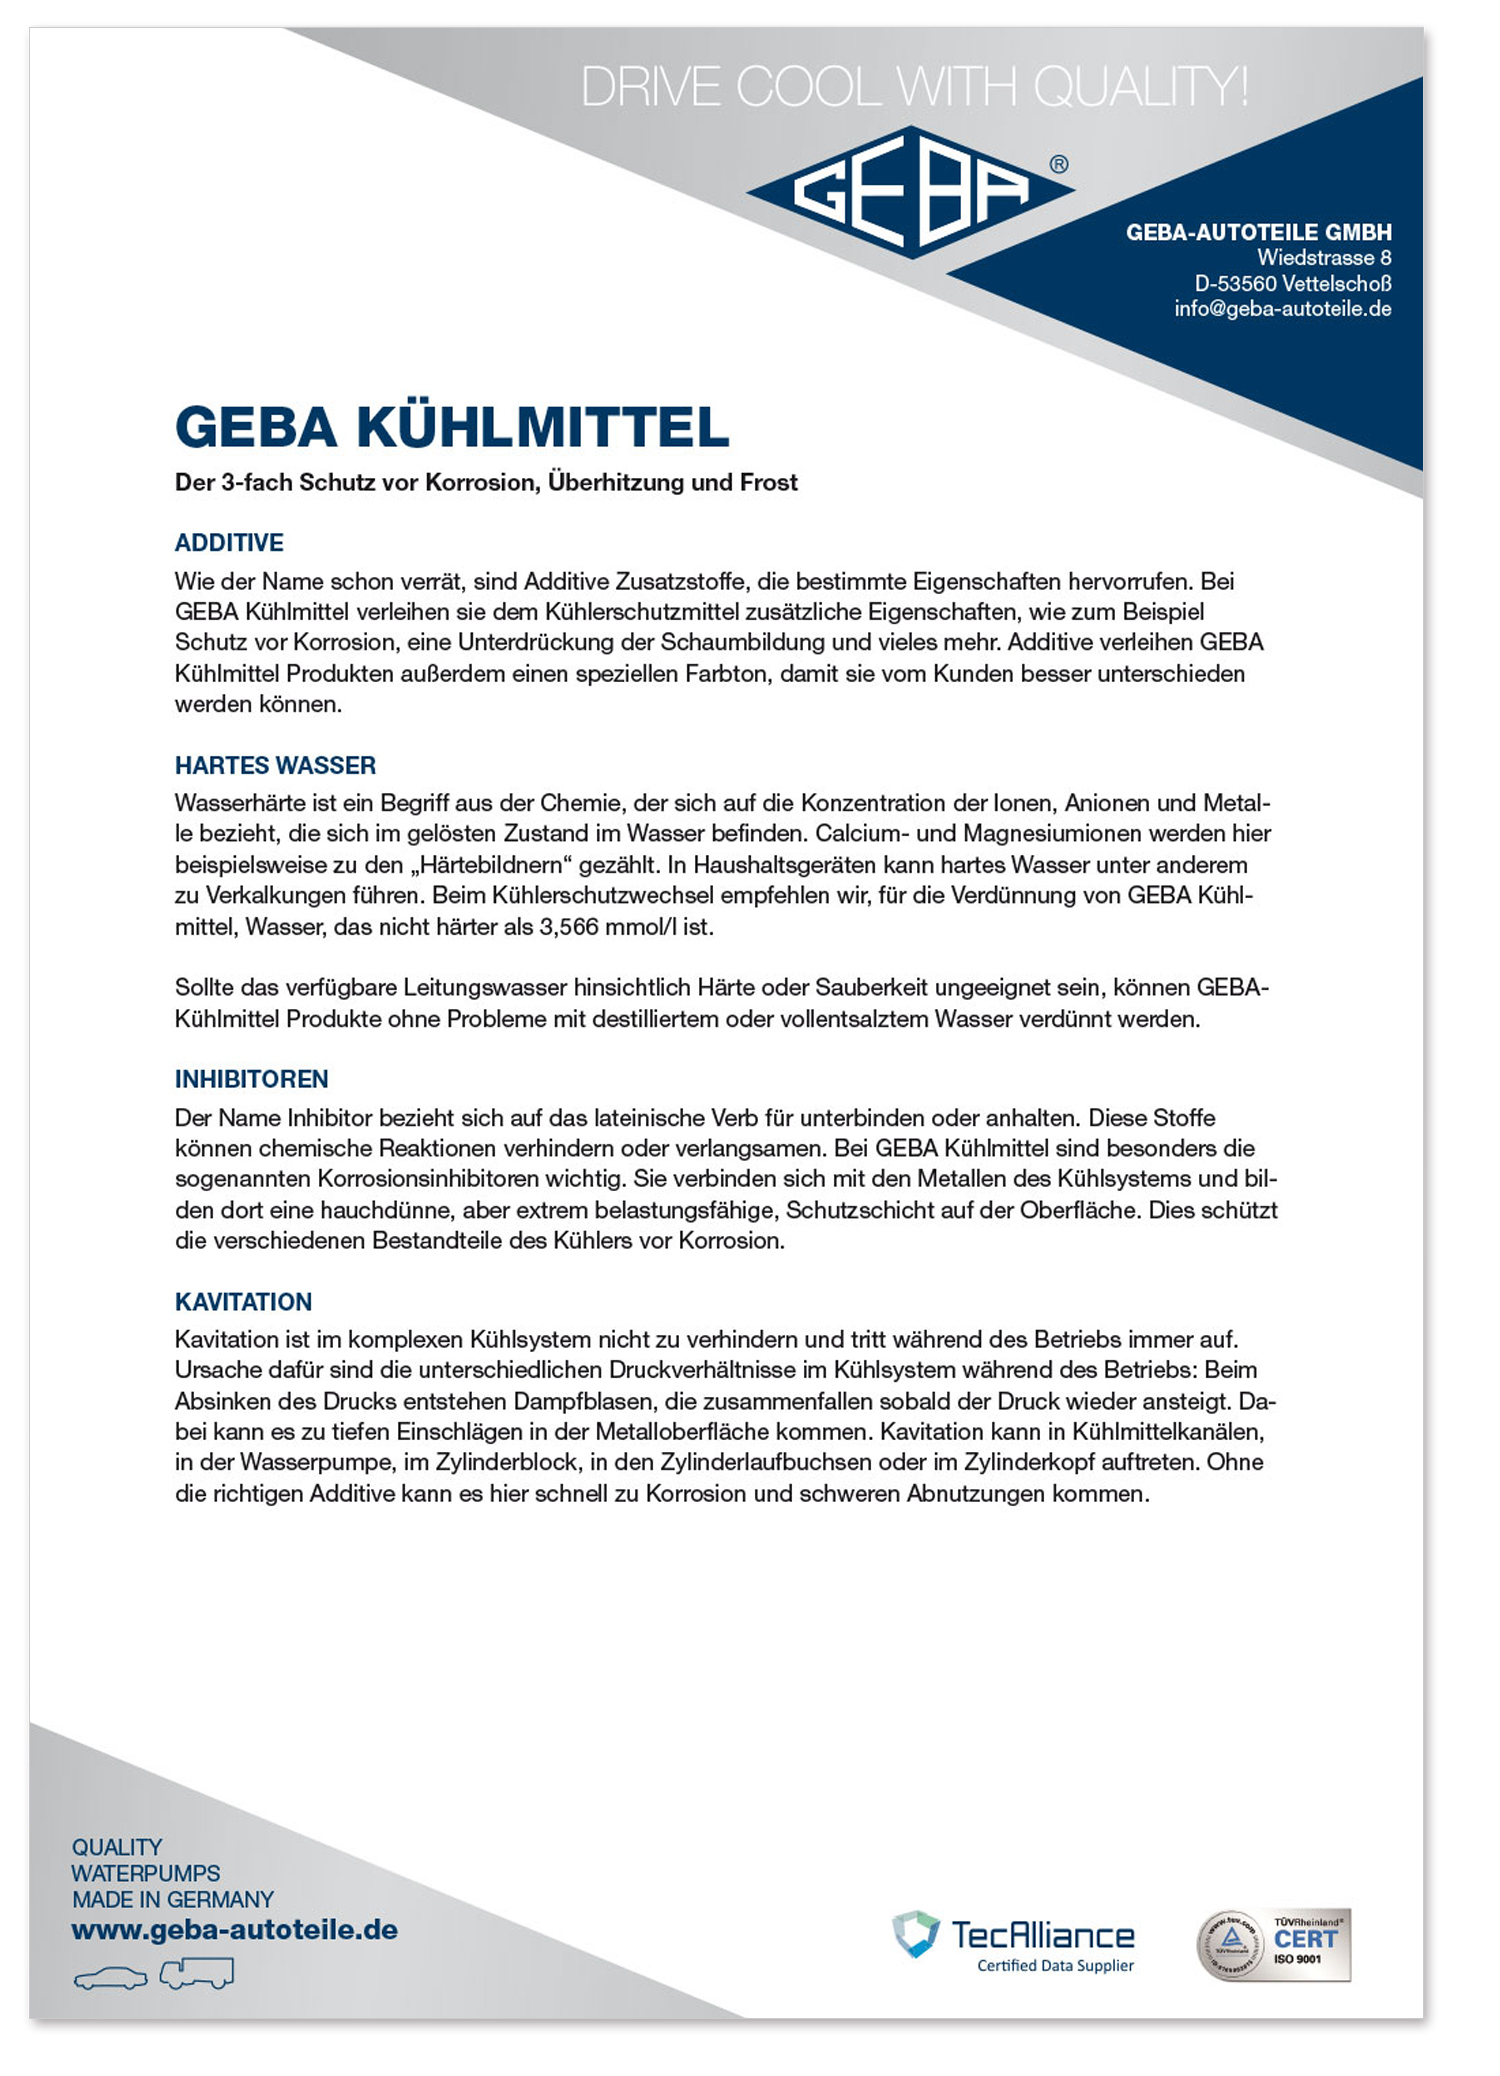 Datenblatt_Geba_neu